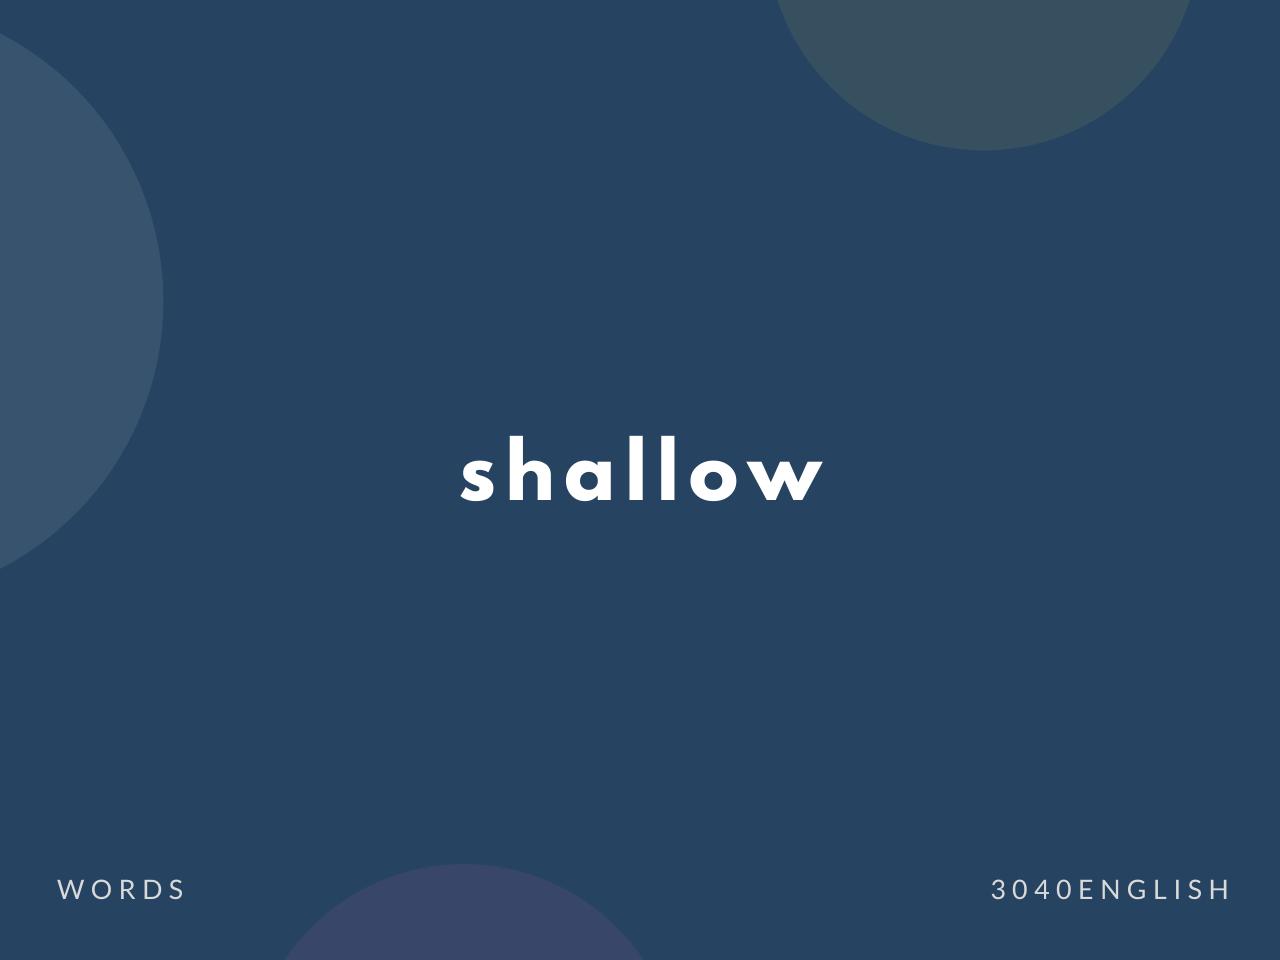 shallow の意味と簡単な使い方【音読用例文あり】